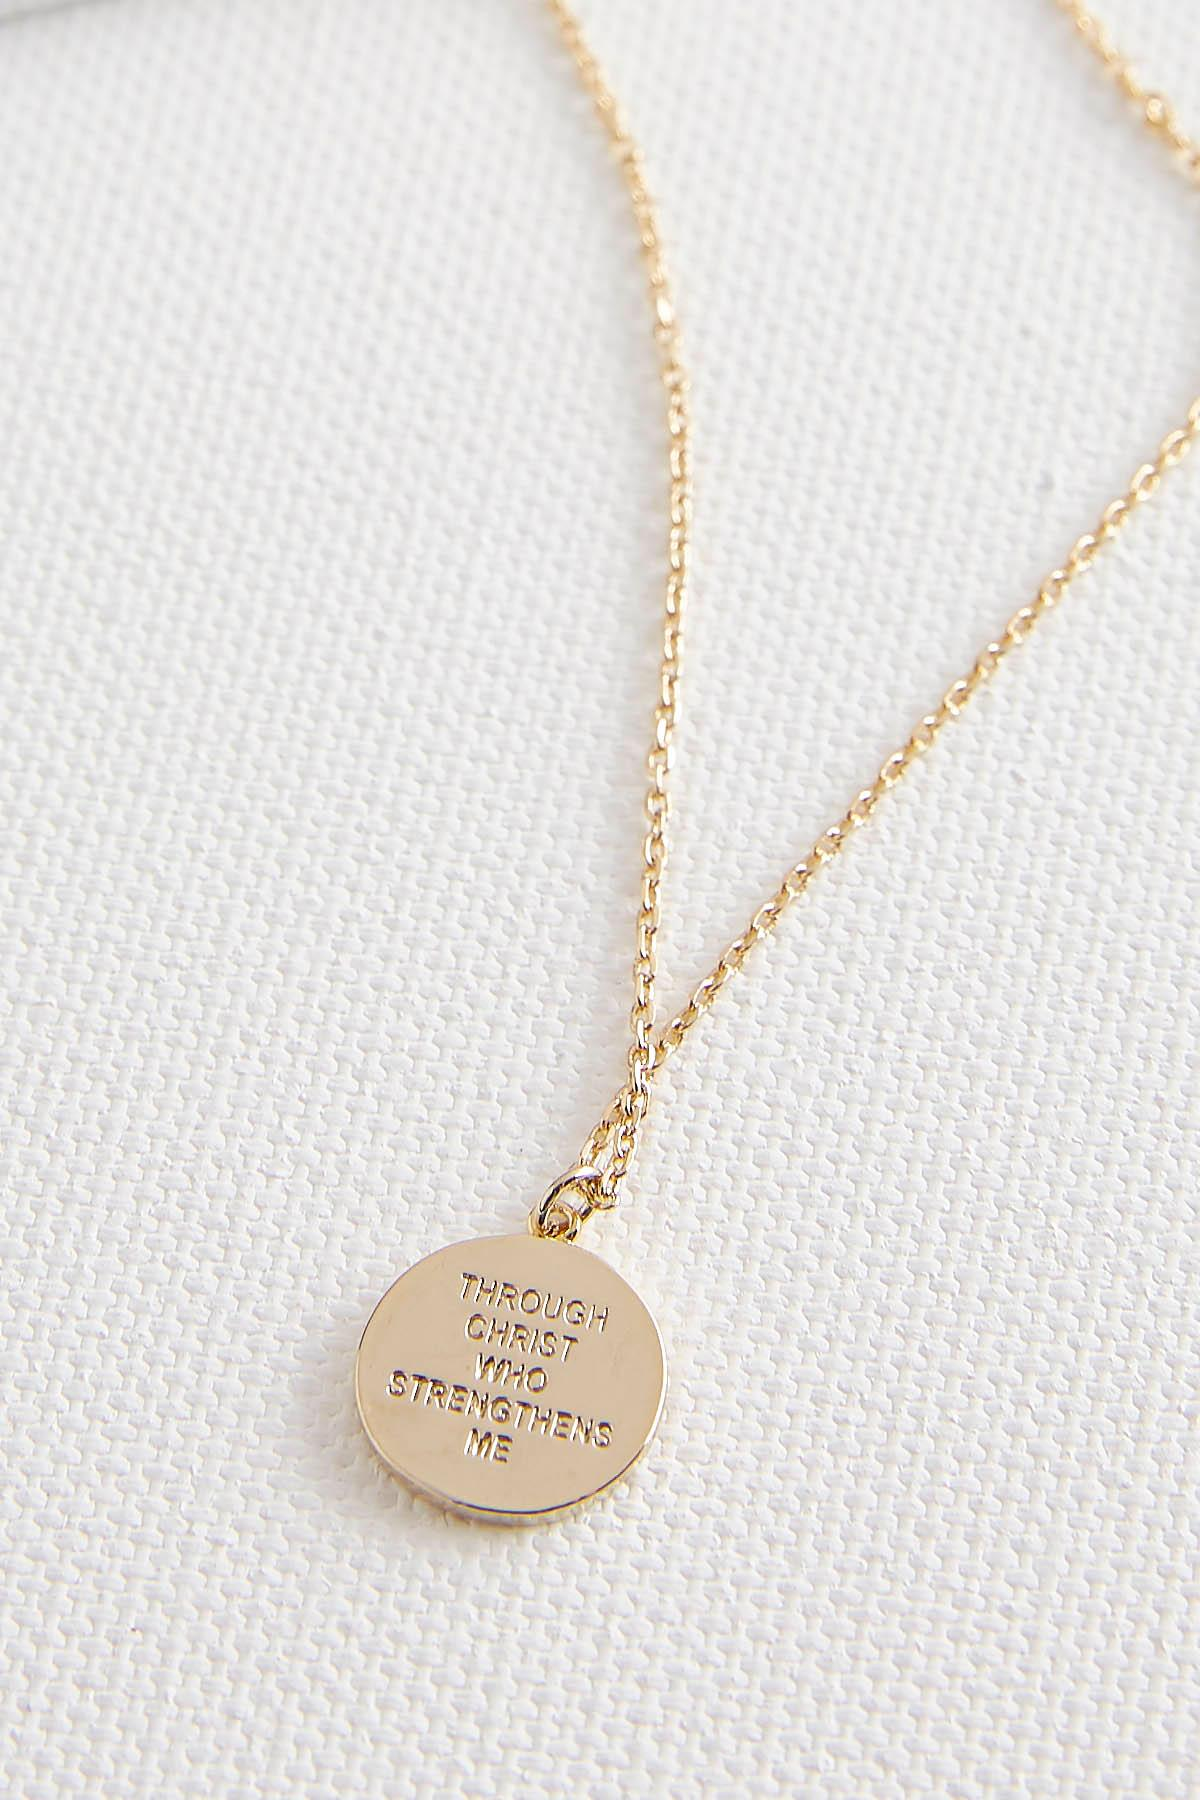 Inspirational Disk Pendant Necklace